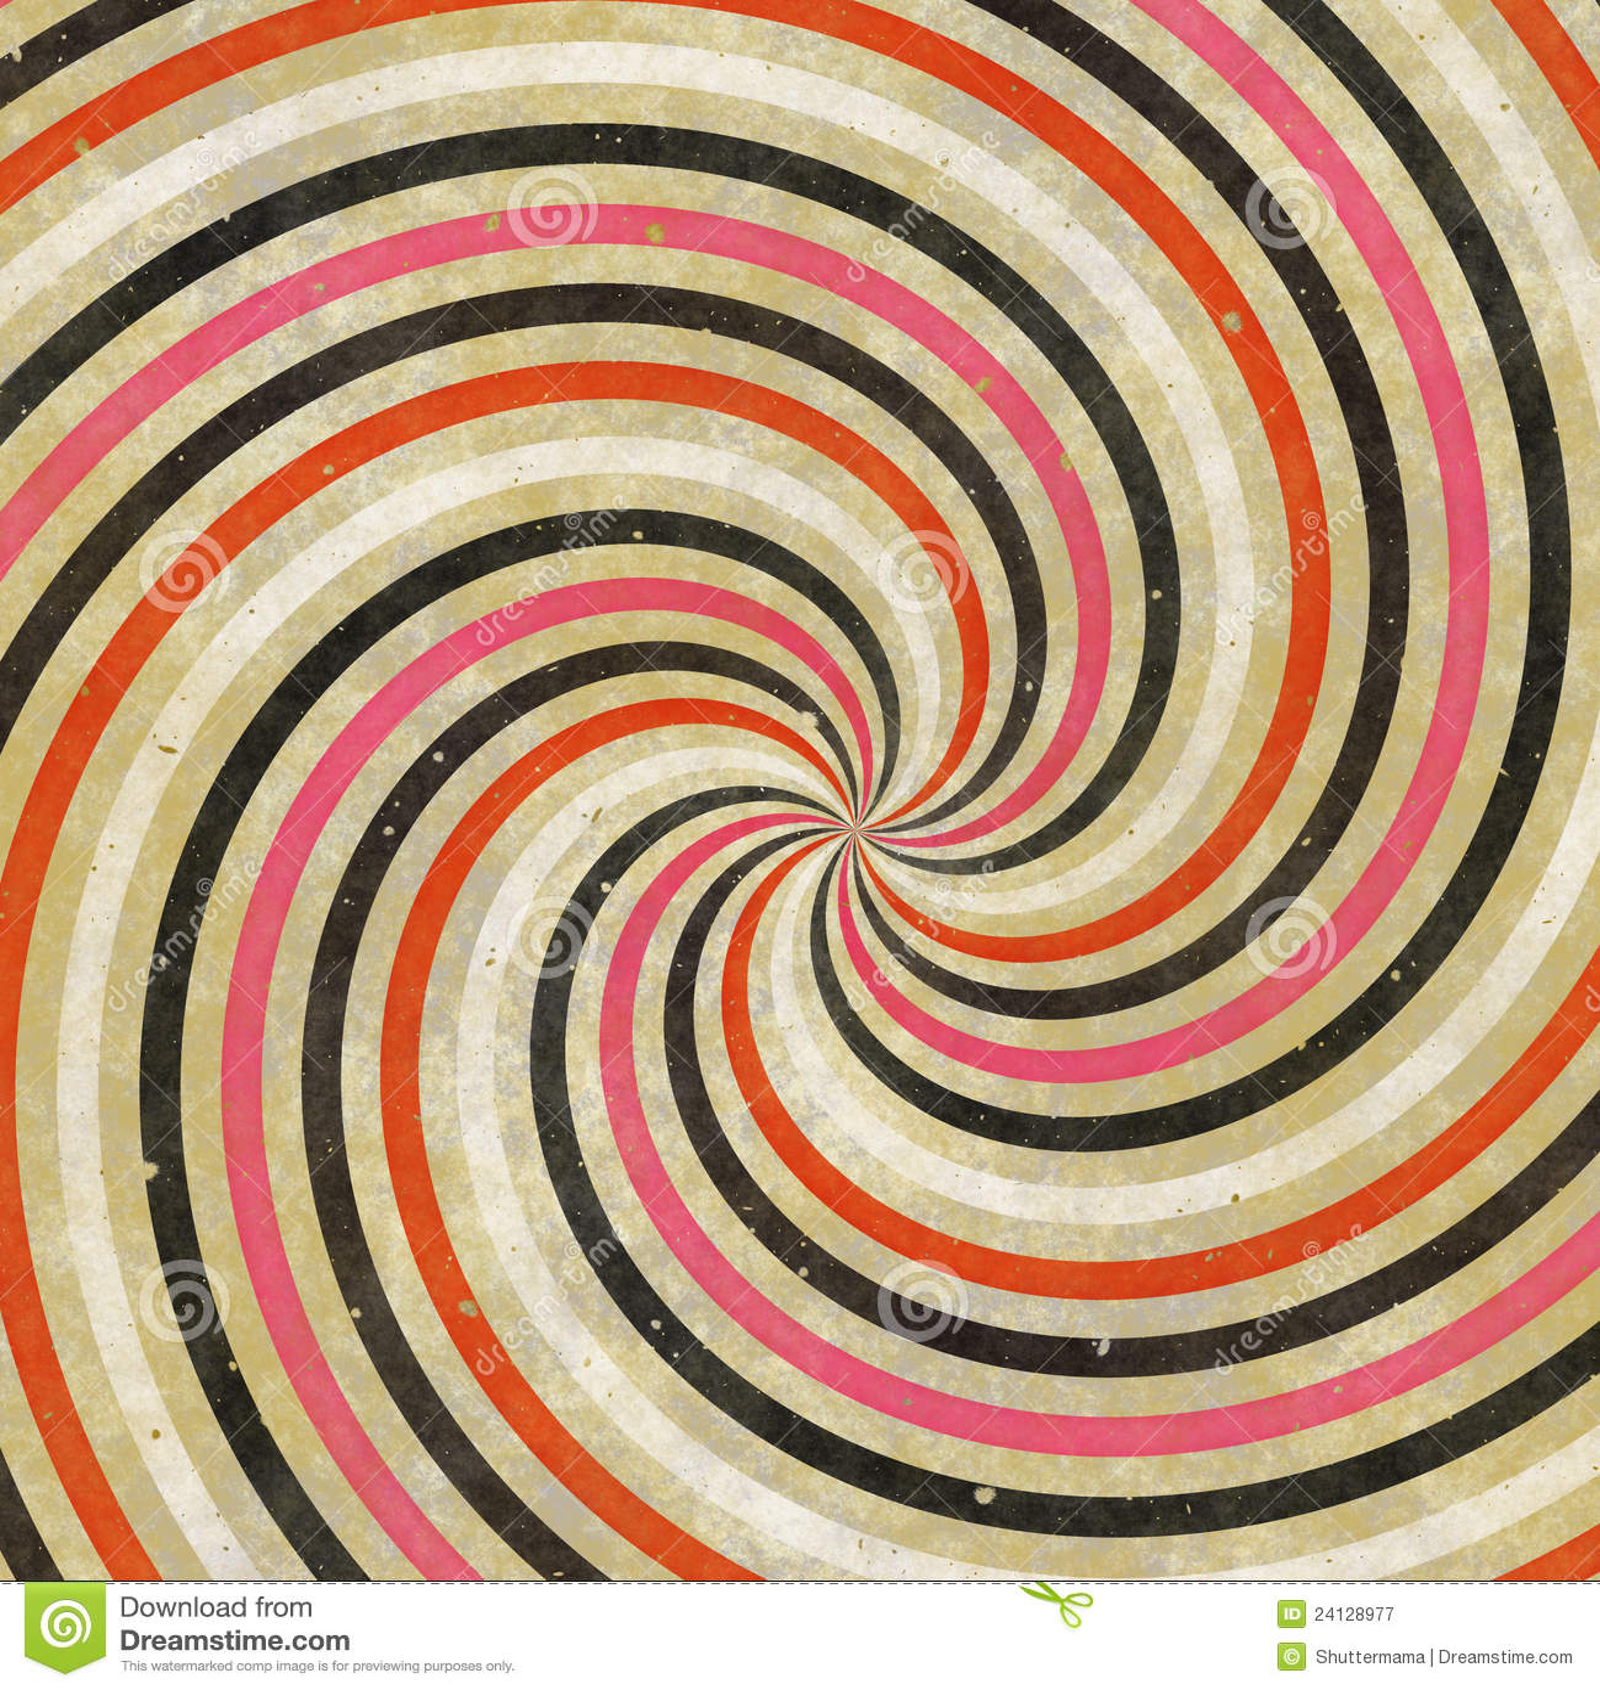 60 39 s 70 39 s retro swirl funky wild spiral rays stock illustration image 24128977. Black Bedroom Furniture Sets. Home Design Ideas